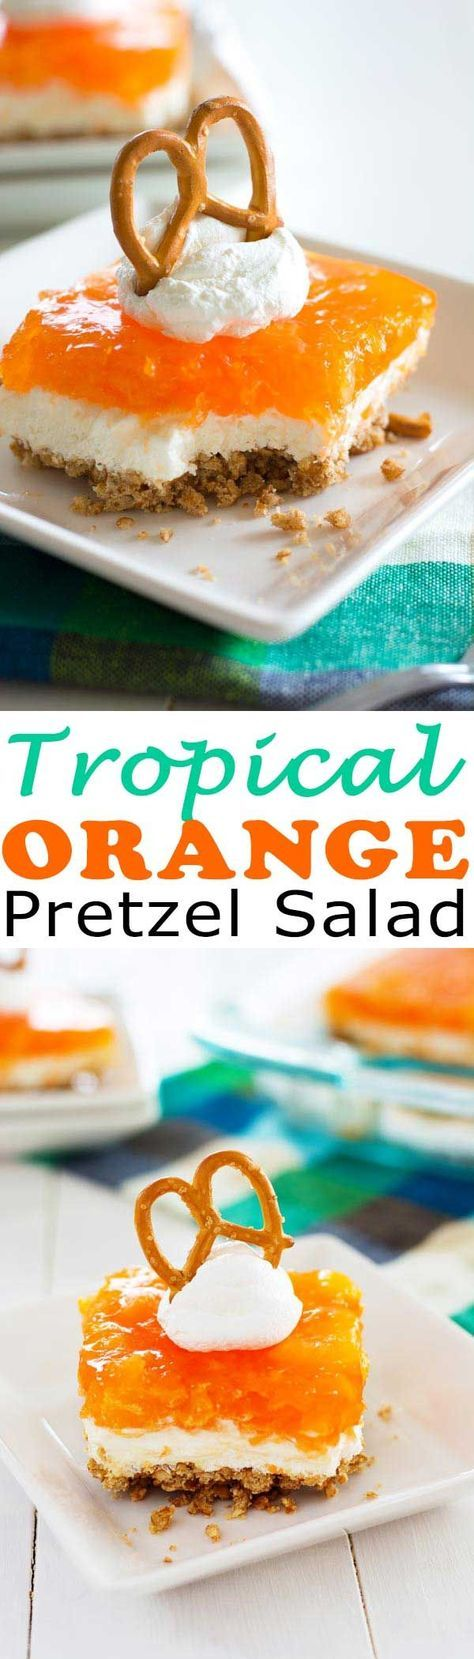 Tropical Orange Pretzel Salad - jello pretzel salad with a pineapple orange twist!